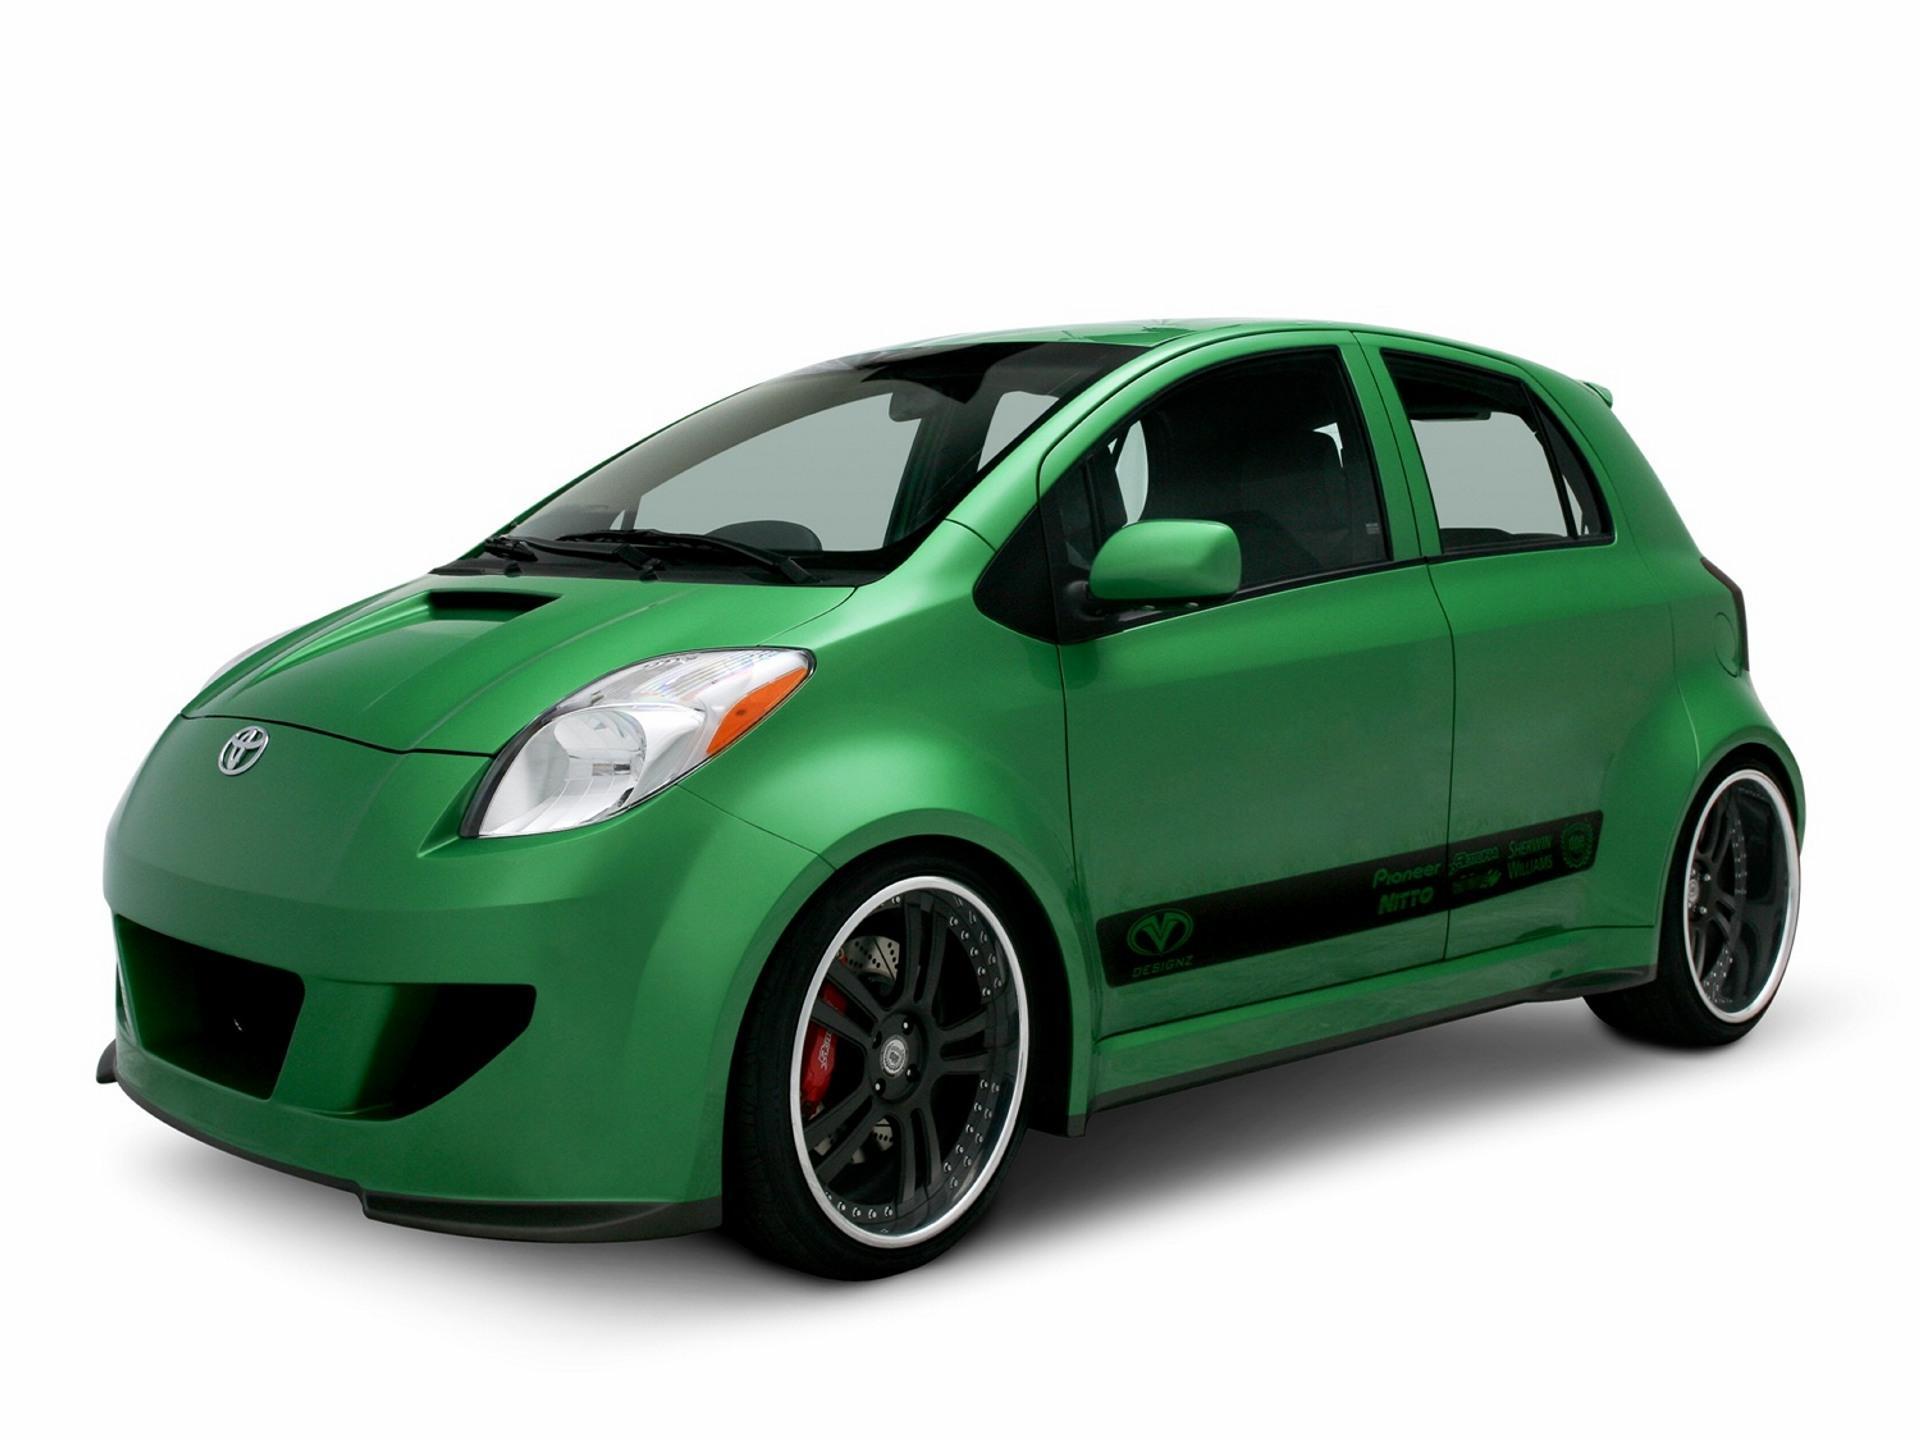 2008 Toyota Yaris Five Door Tailback News And Information